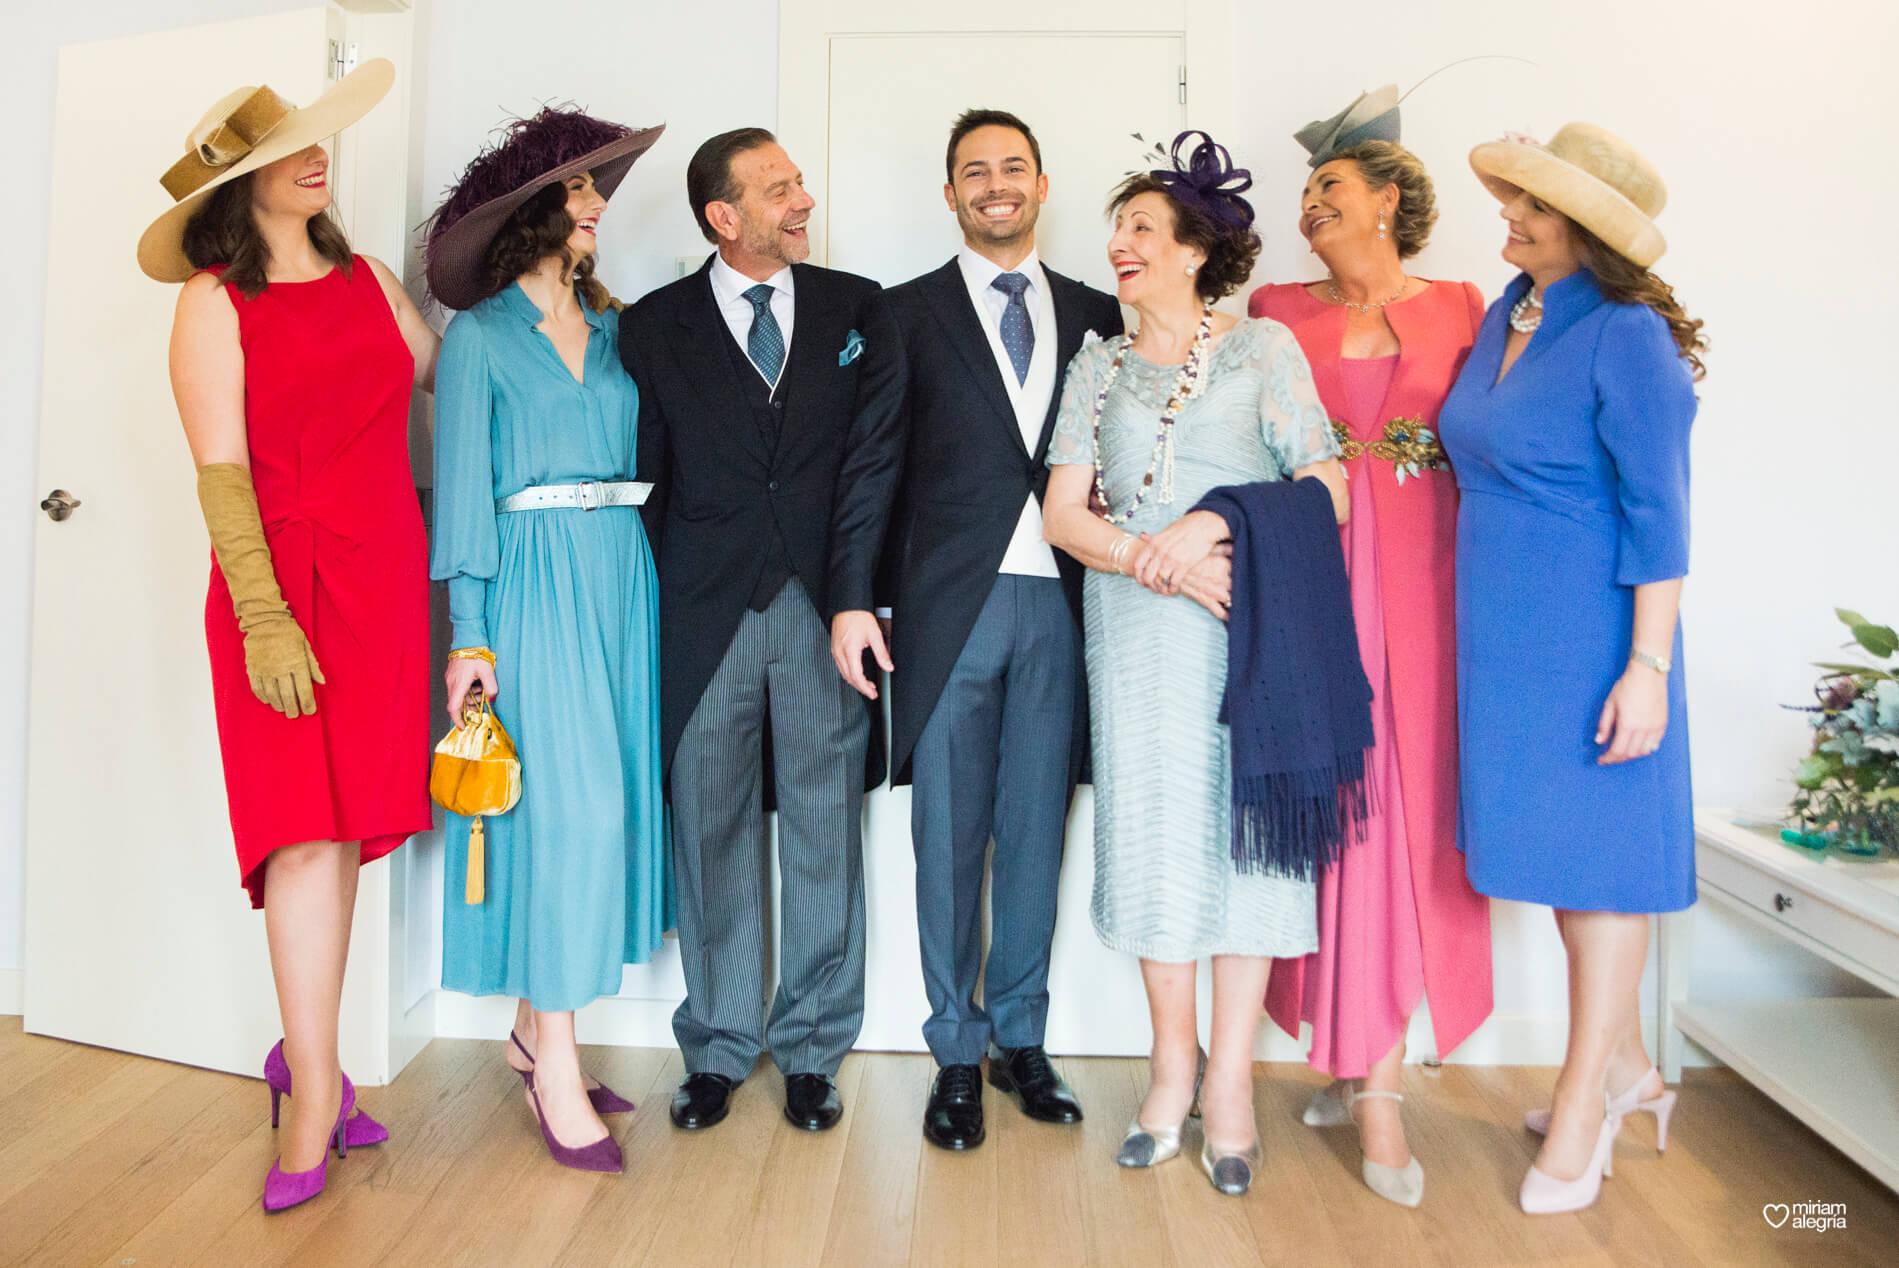 vestido-de-novia-paula-del-vas-miriam-alegria-fotografos-boda-murcia-176